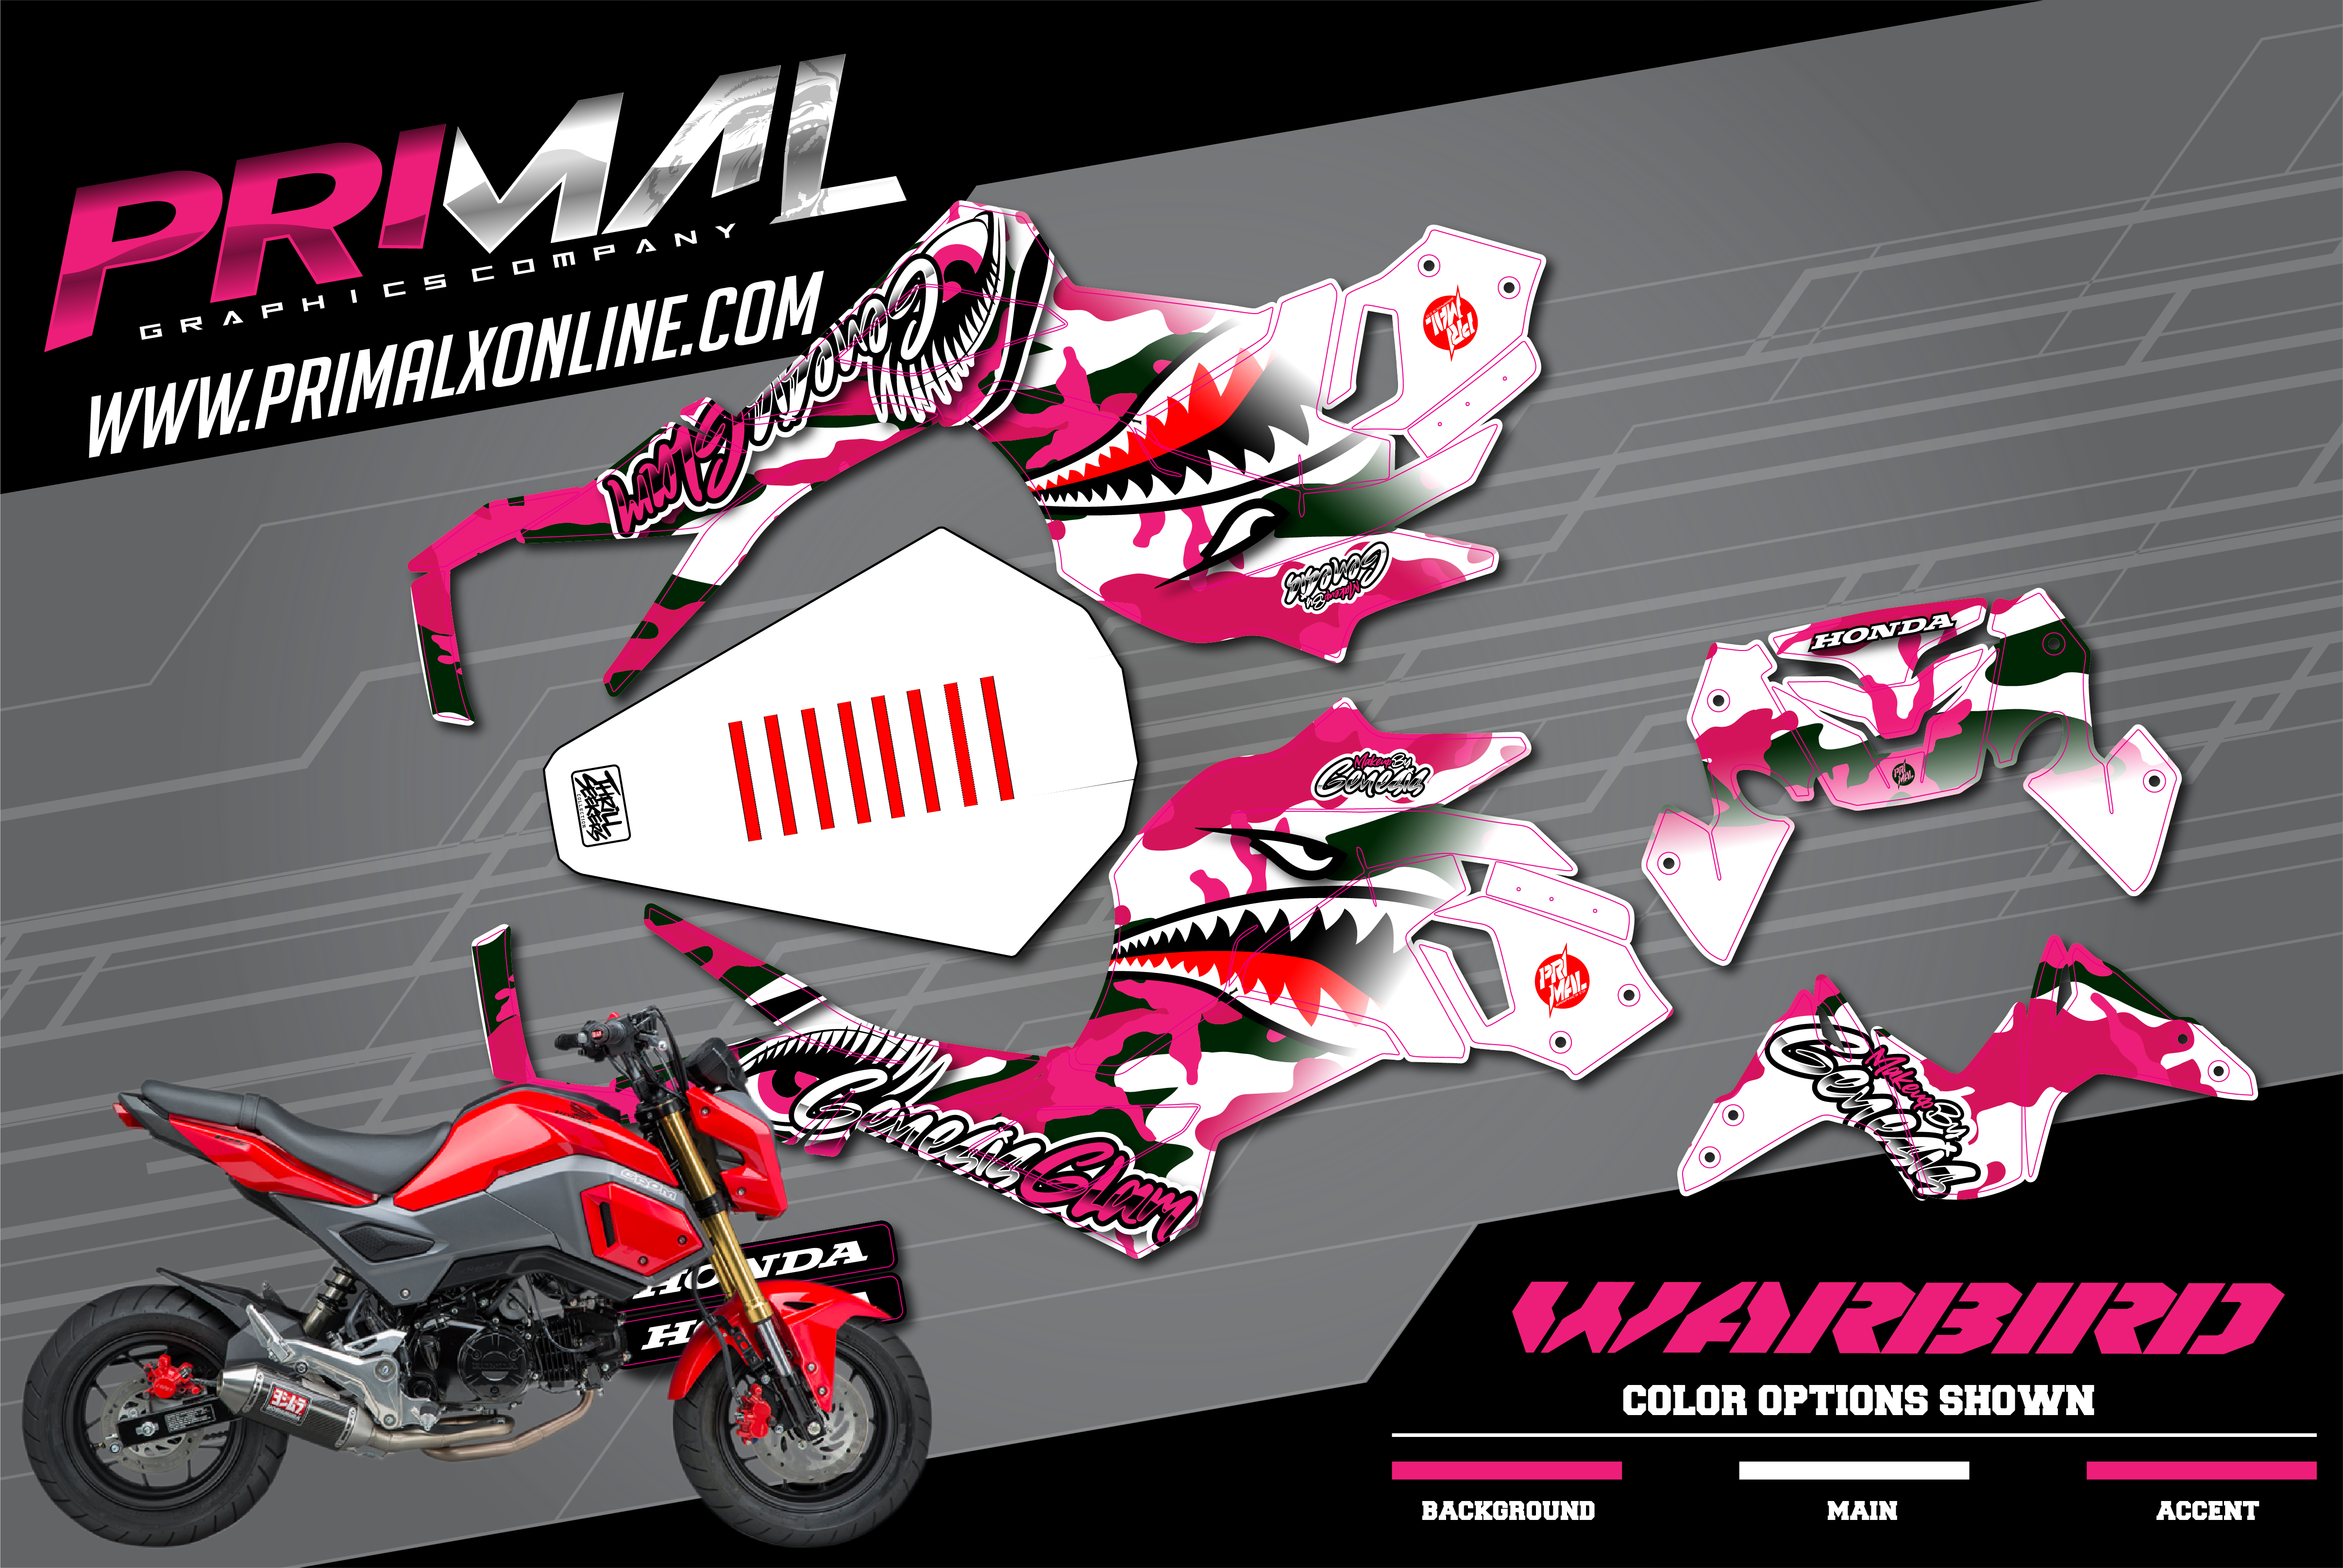 PRIMAL-X-MOTORSPORTS-PRIMAL-GRAPHICS-CO-HONDA-GROM-CAMO-SERIES-MOTOCROSS-GRAPHICS-RETRO-PRIMAL-GFX-CO-MX-GRAPHICS-MX-DECALS-01-01